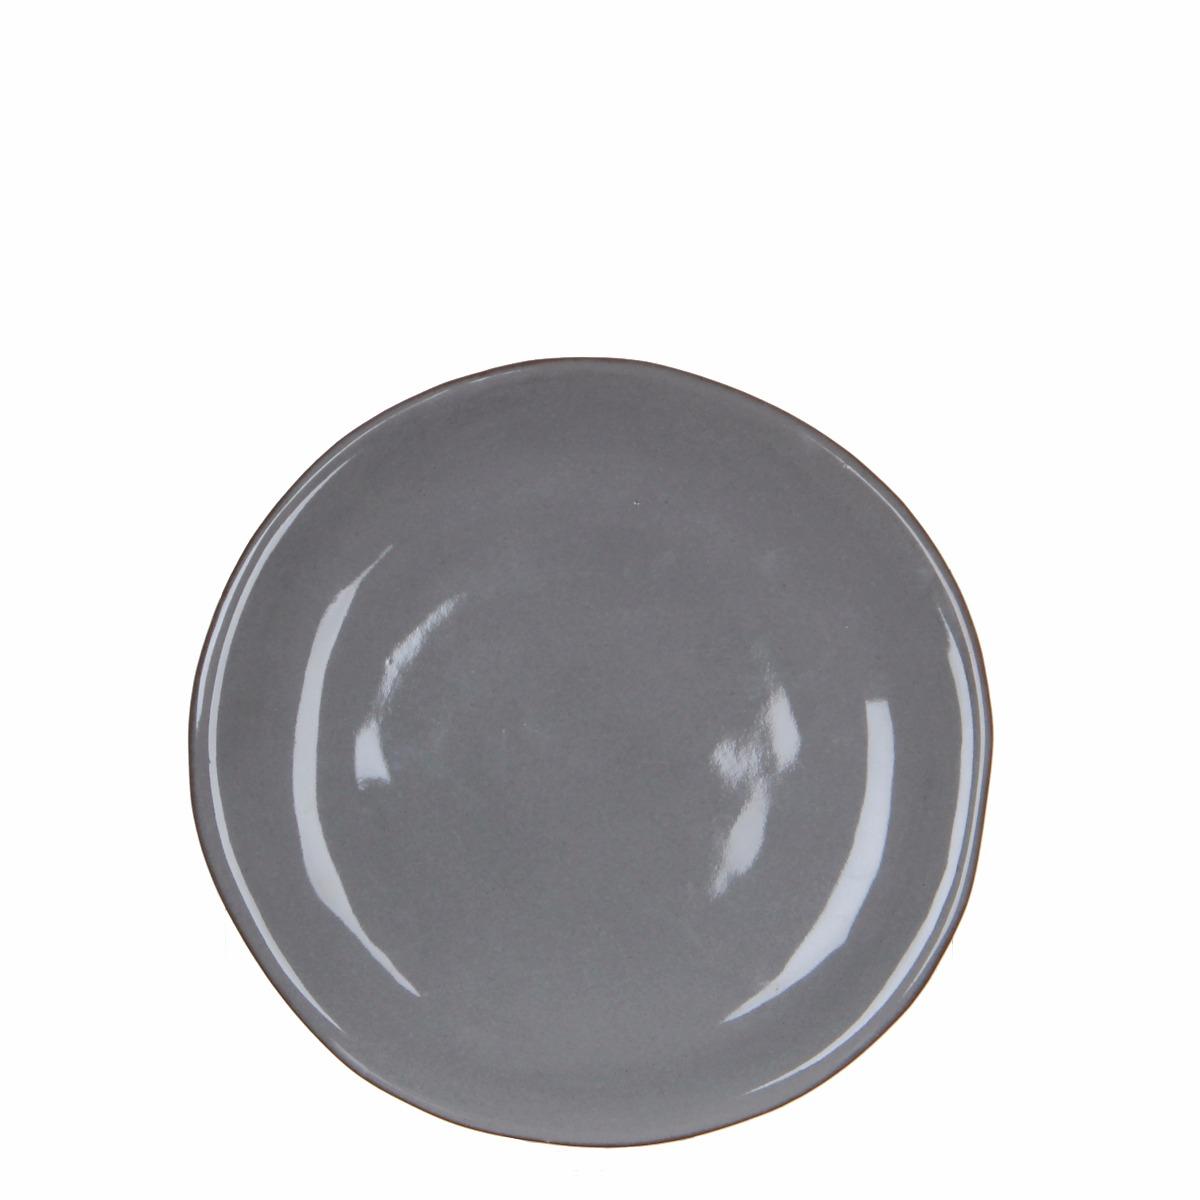 Afbeelding van Casa vivante bord ursula grijs h2xd22cm